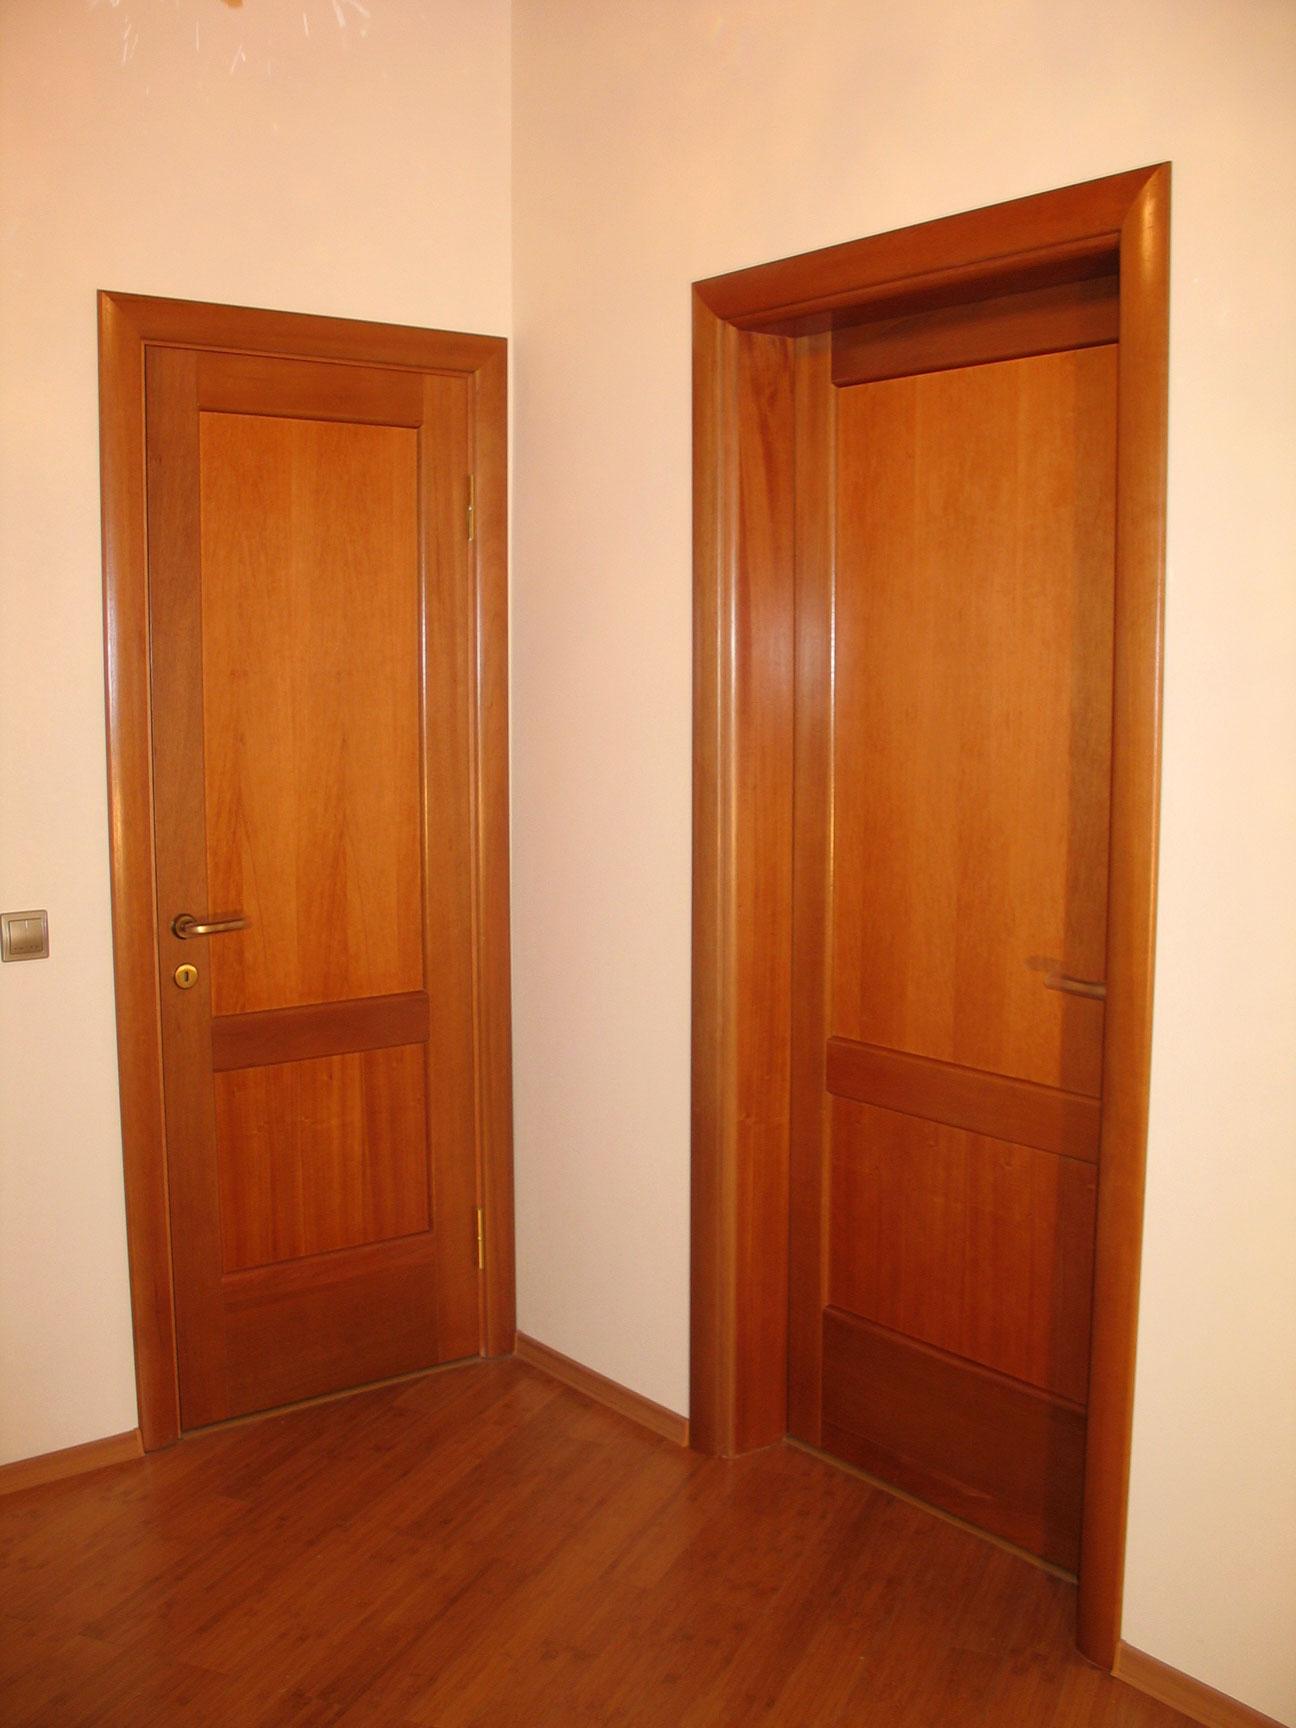 фото продажа комнатных дверей